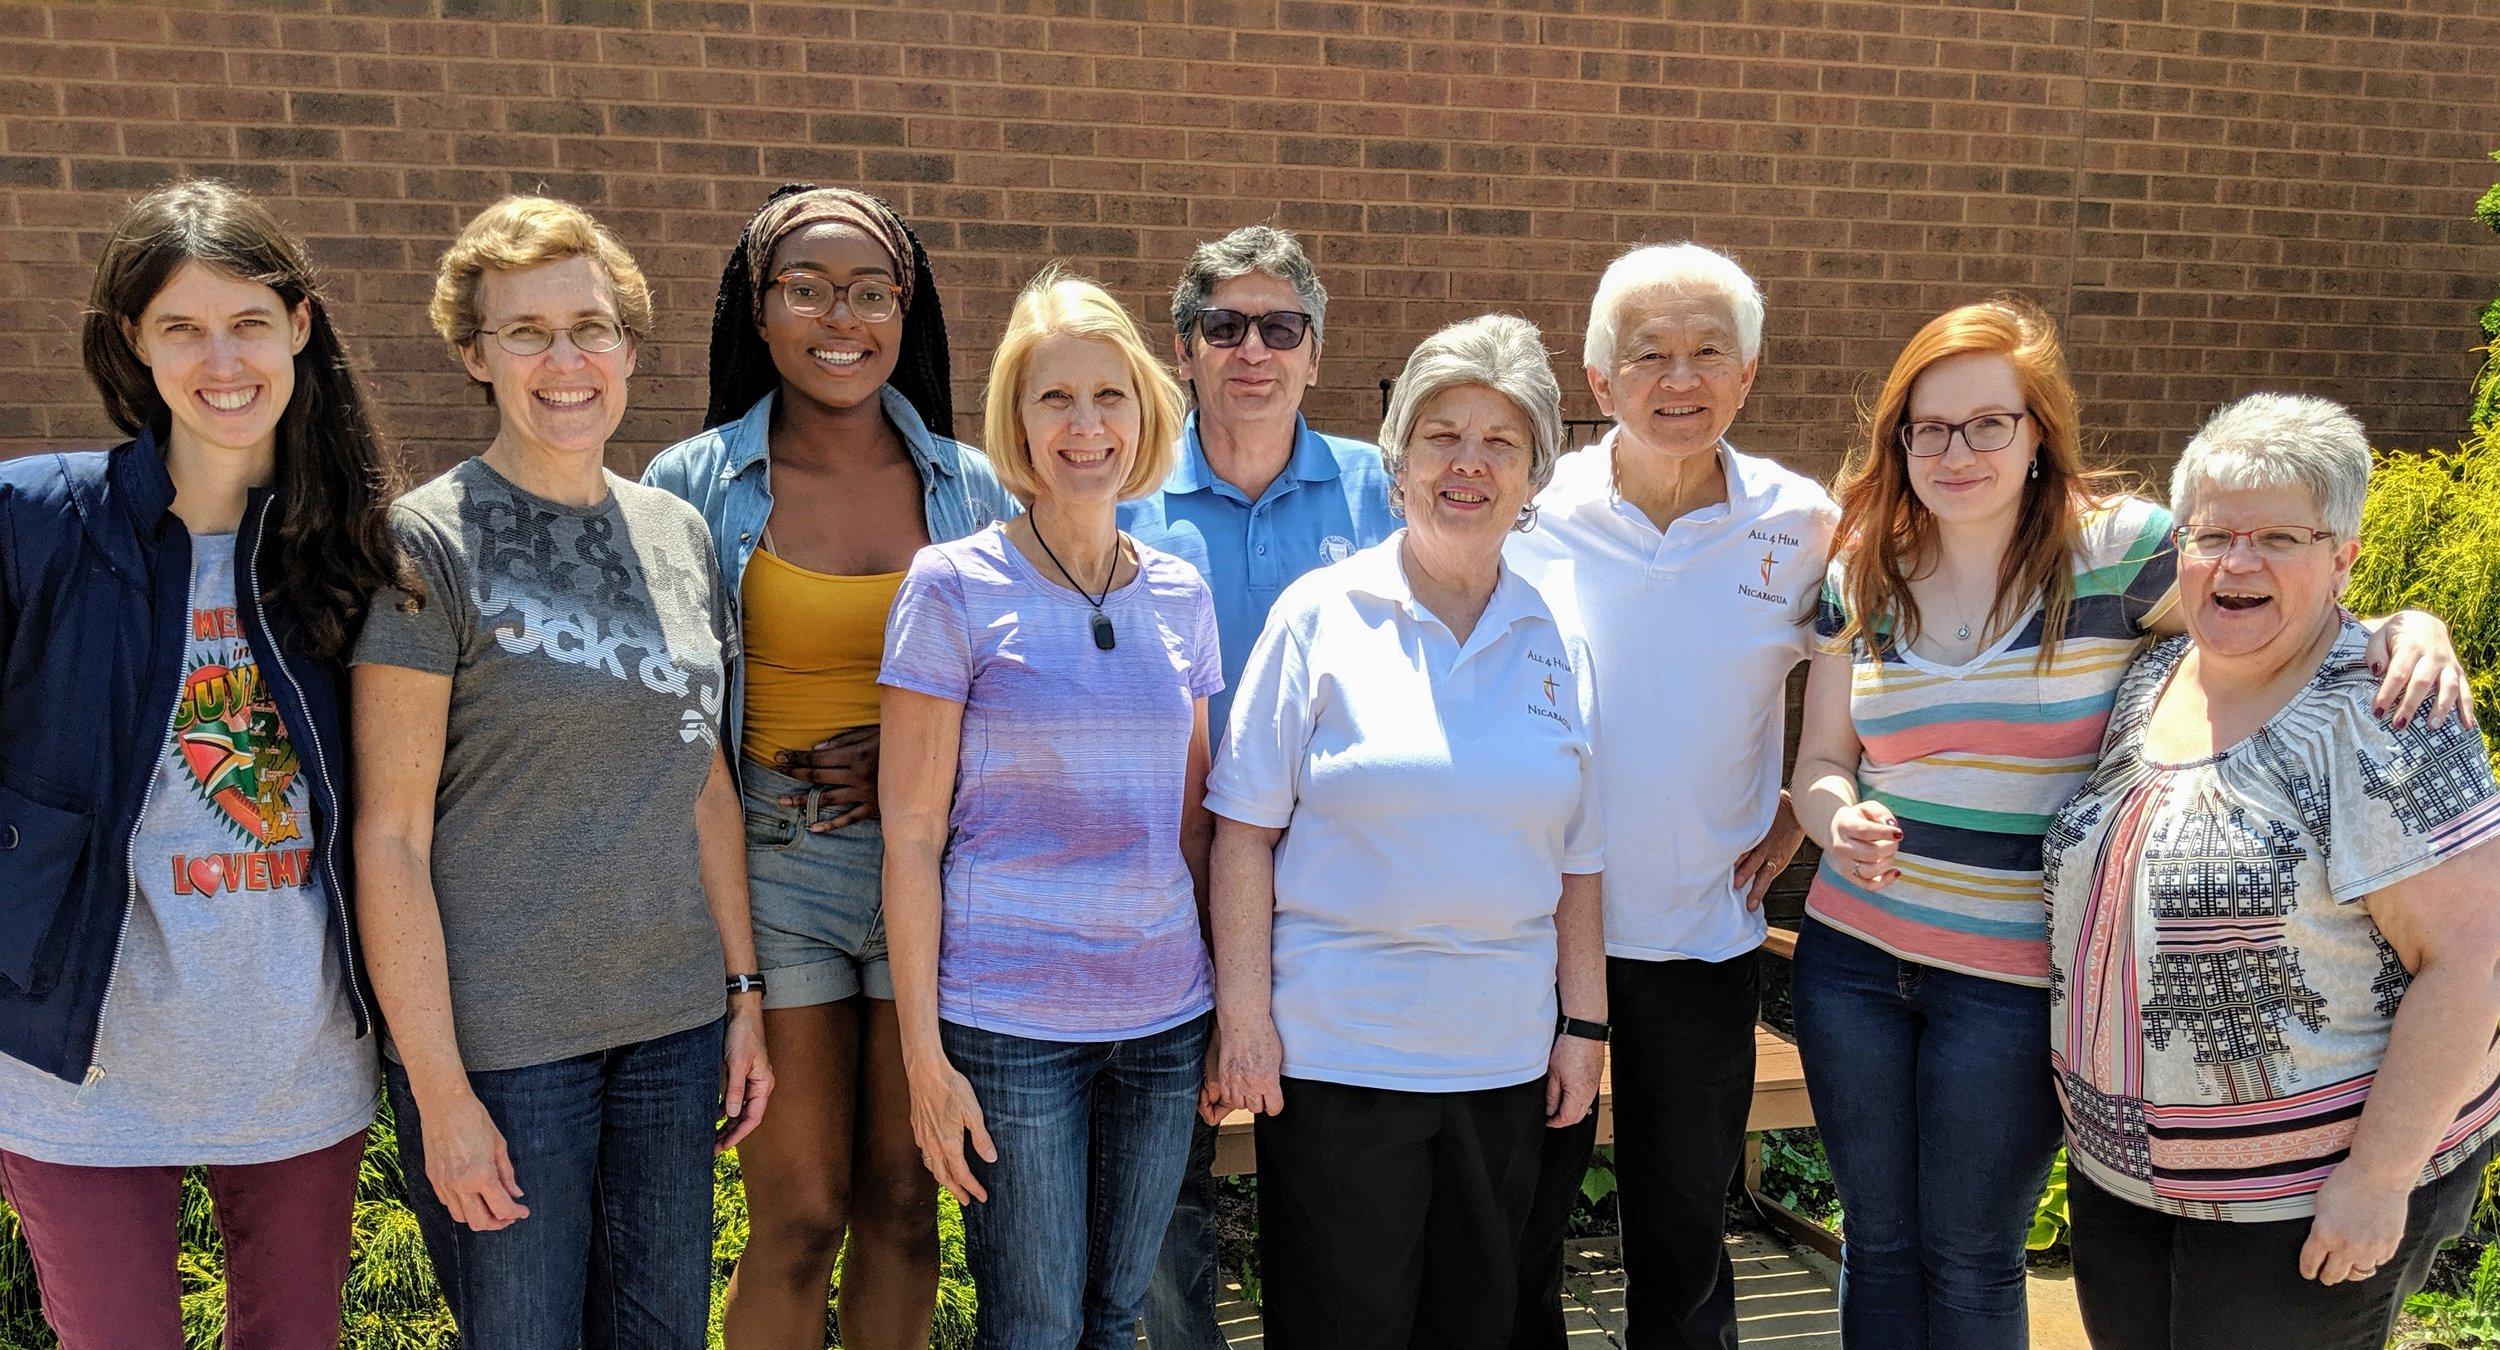 Nicaragua Mission Team 2019 from left to right: Heather Boyd, Barbara Taylor, Christine Etchu-Njang, Sue & David Aristone, Laura & Conrad Fujimoto and Emilie & Geraldine McCauley.